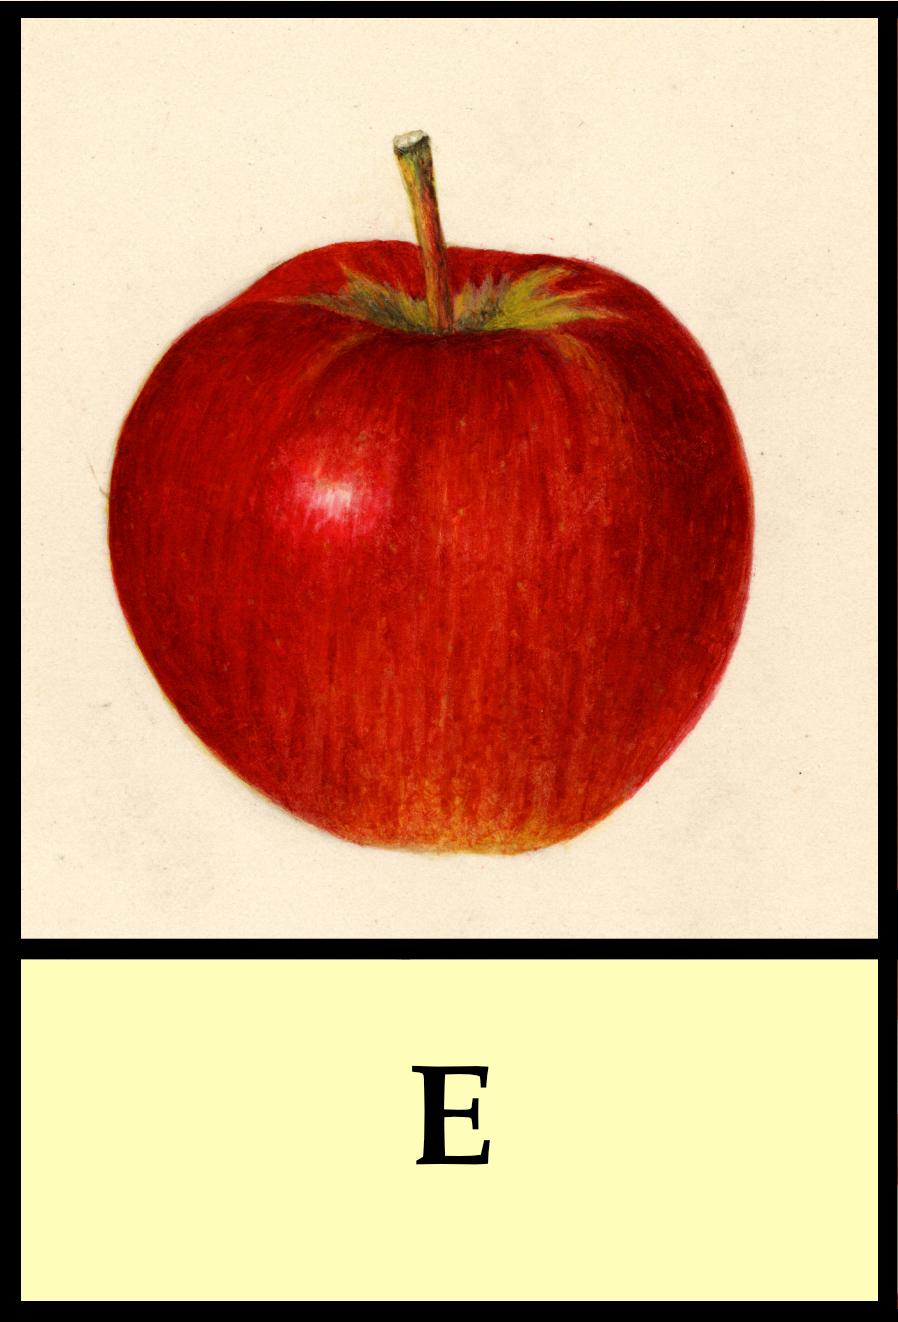 E apples